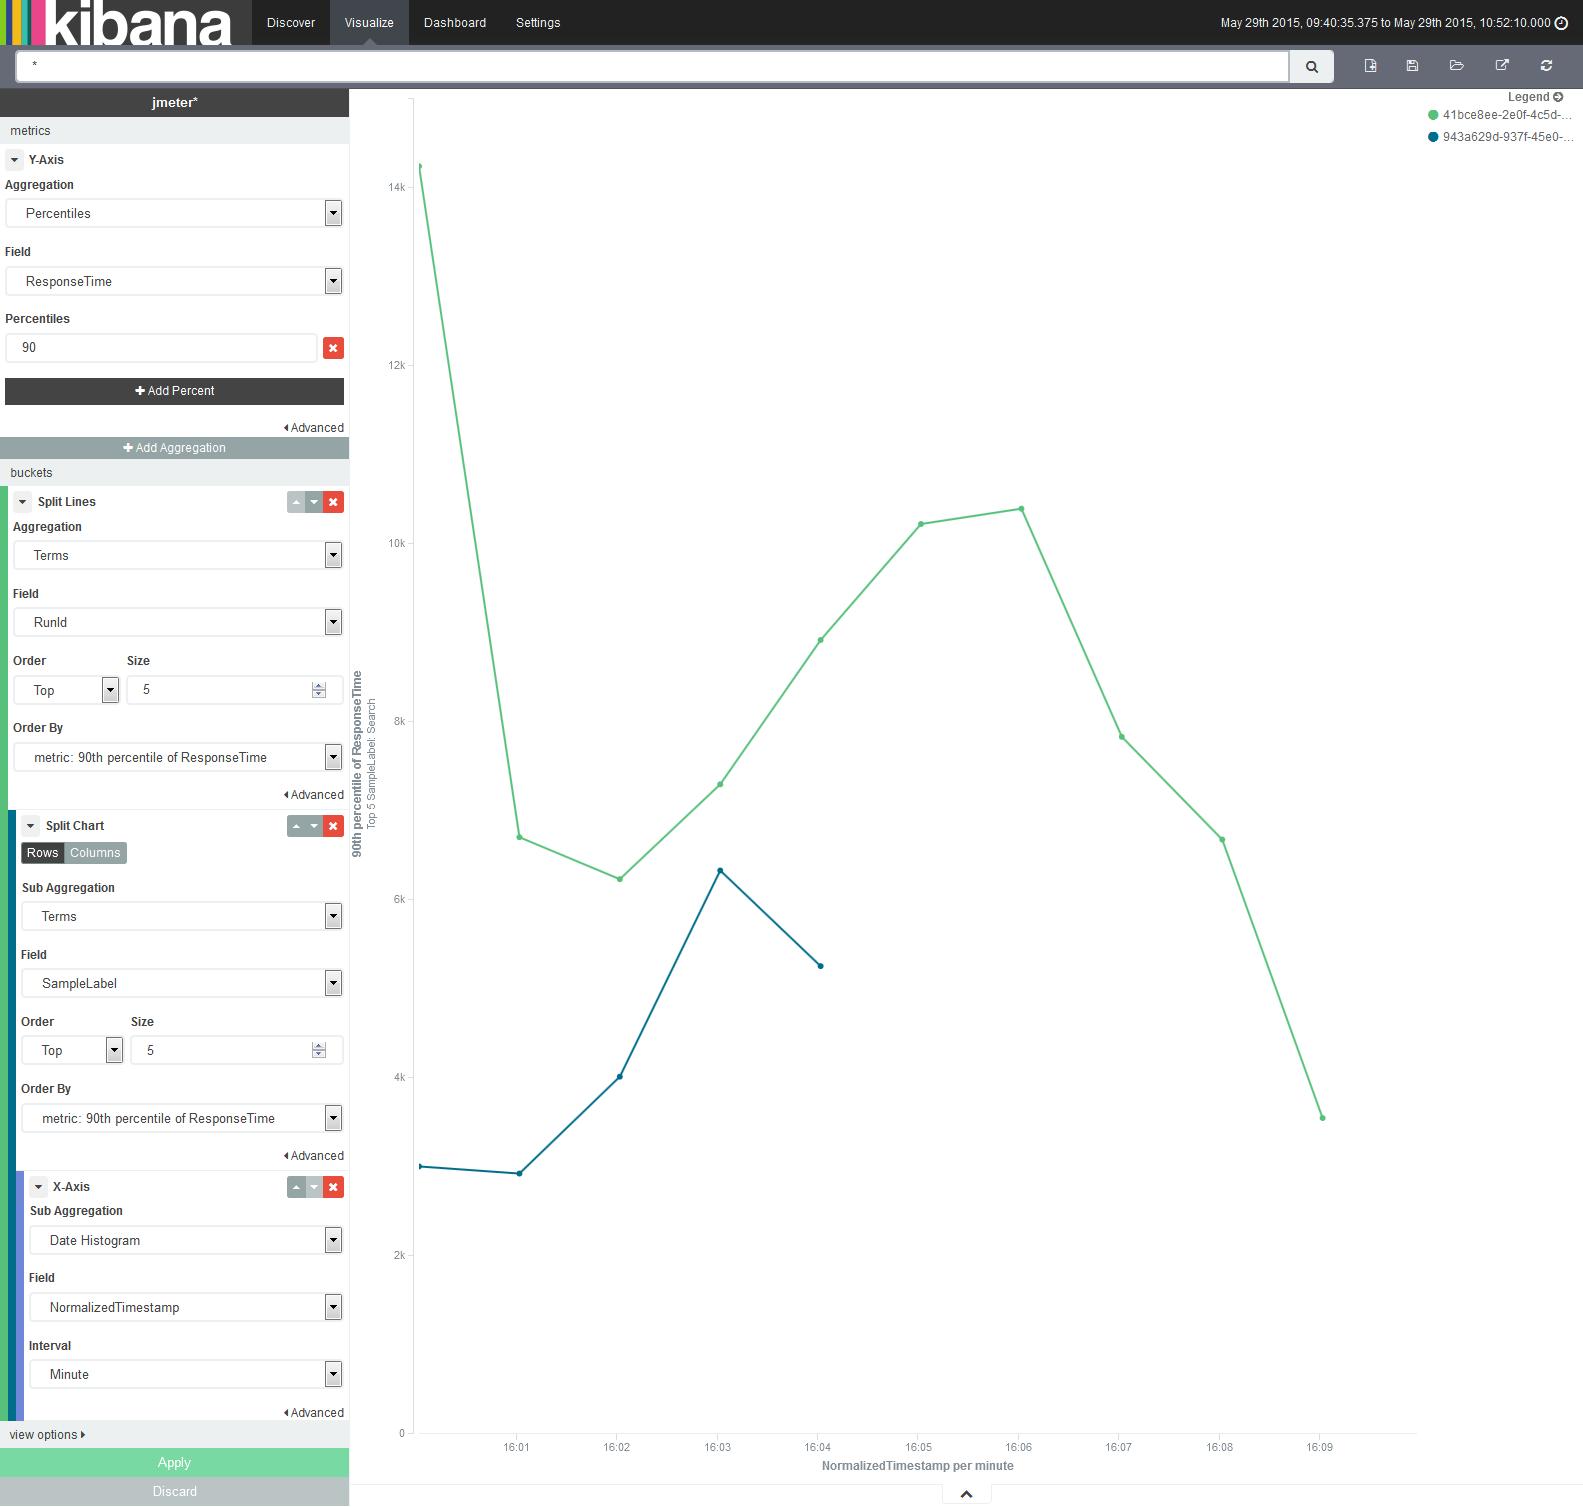 Workaholic: Graphs for Jmeter using Elasticsearch and Kibana